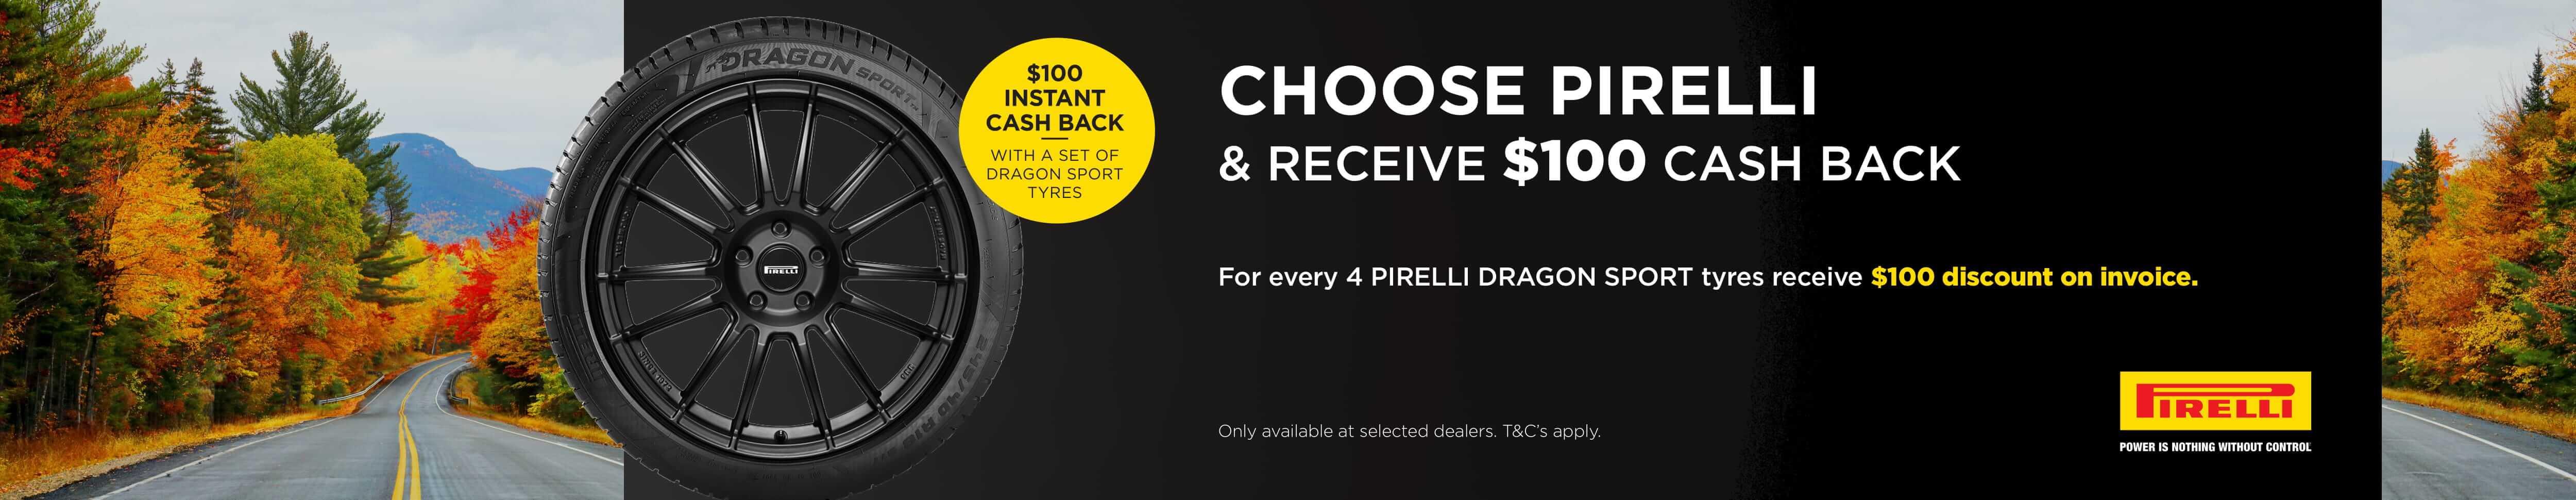 Choose Pirelli and receive $100 cash back